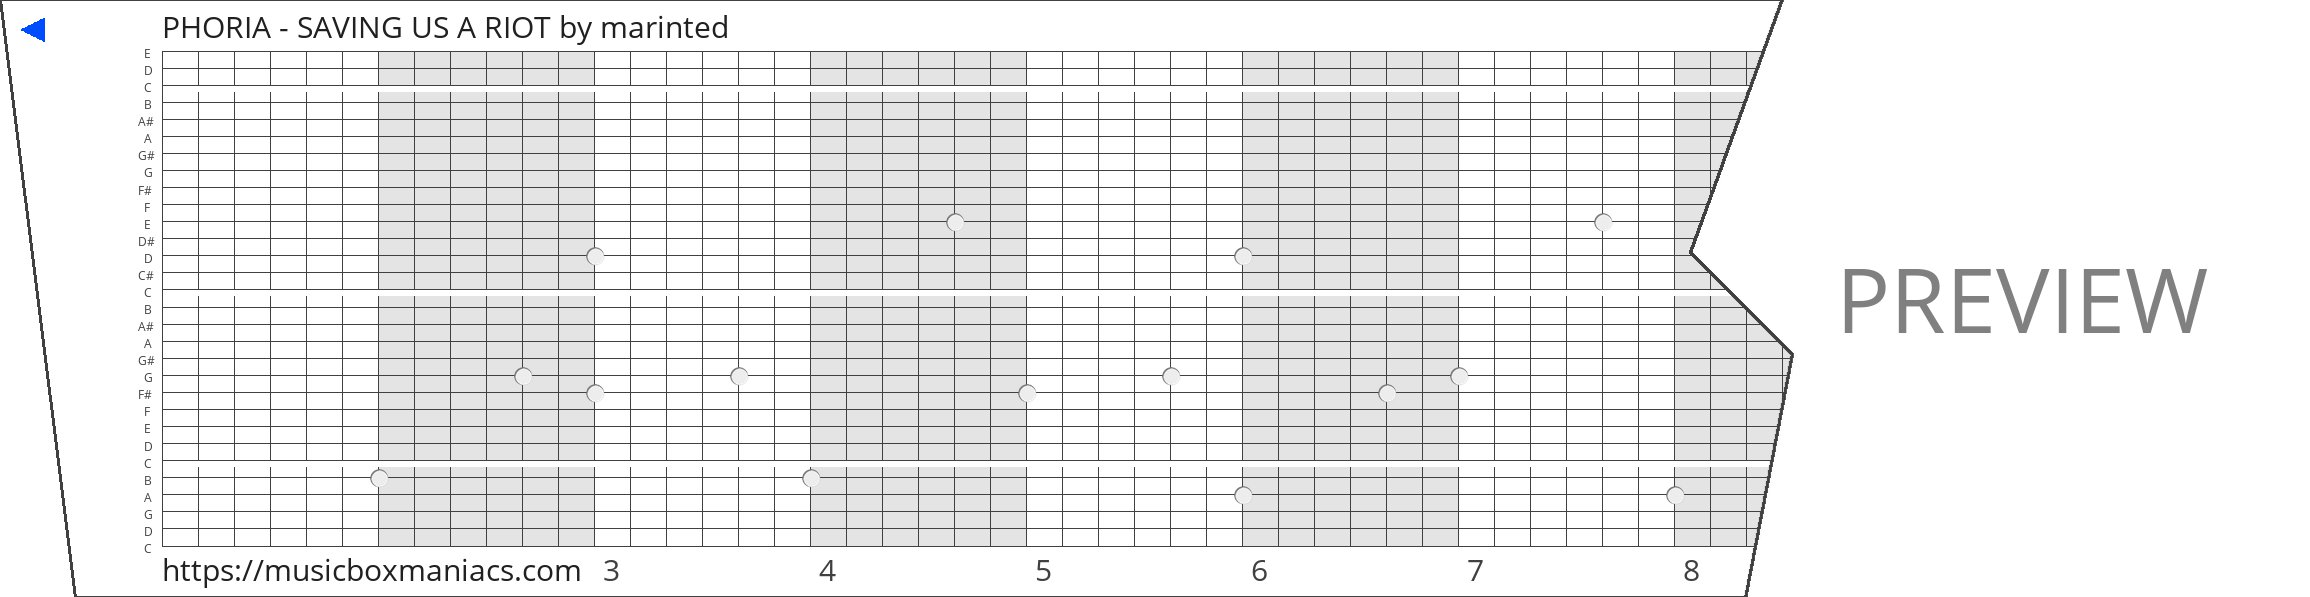 PHORIA - SAVING US A RIOT 30 note music box paper strip